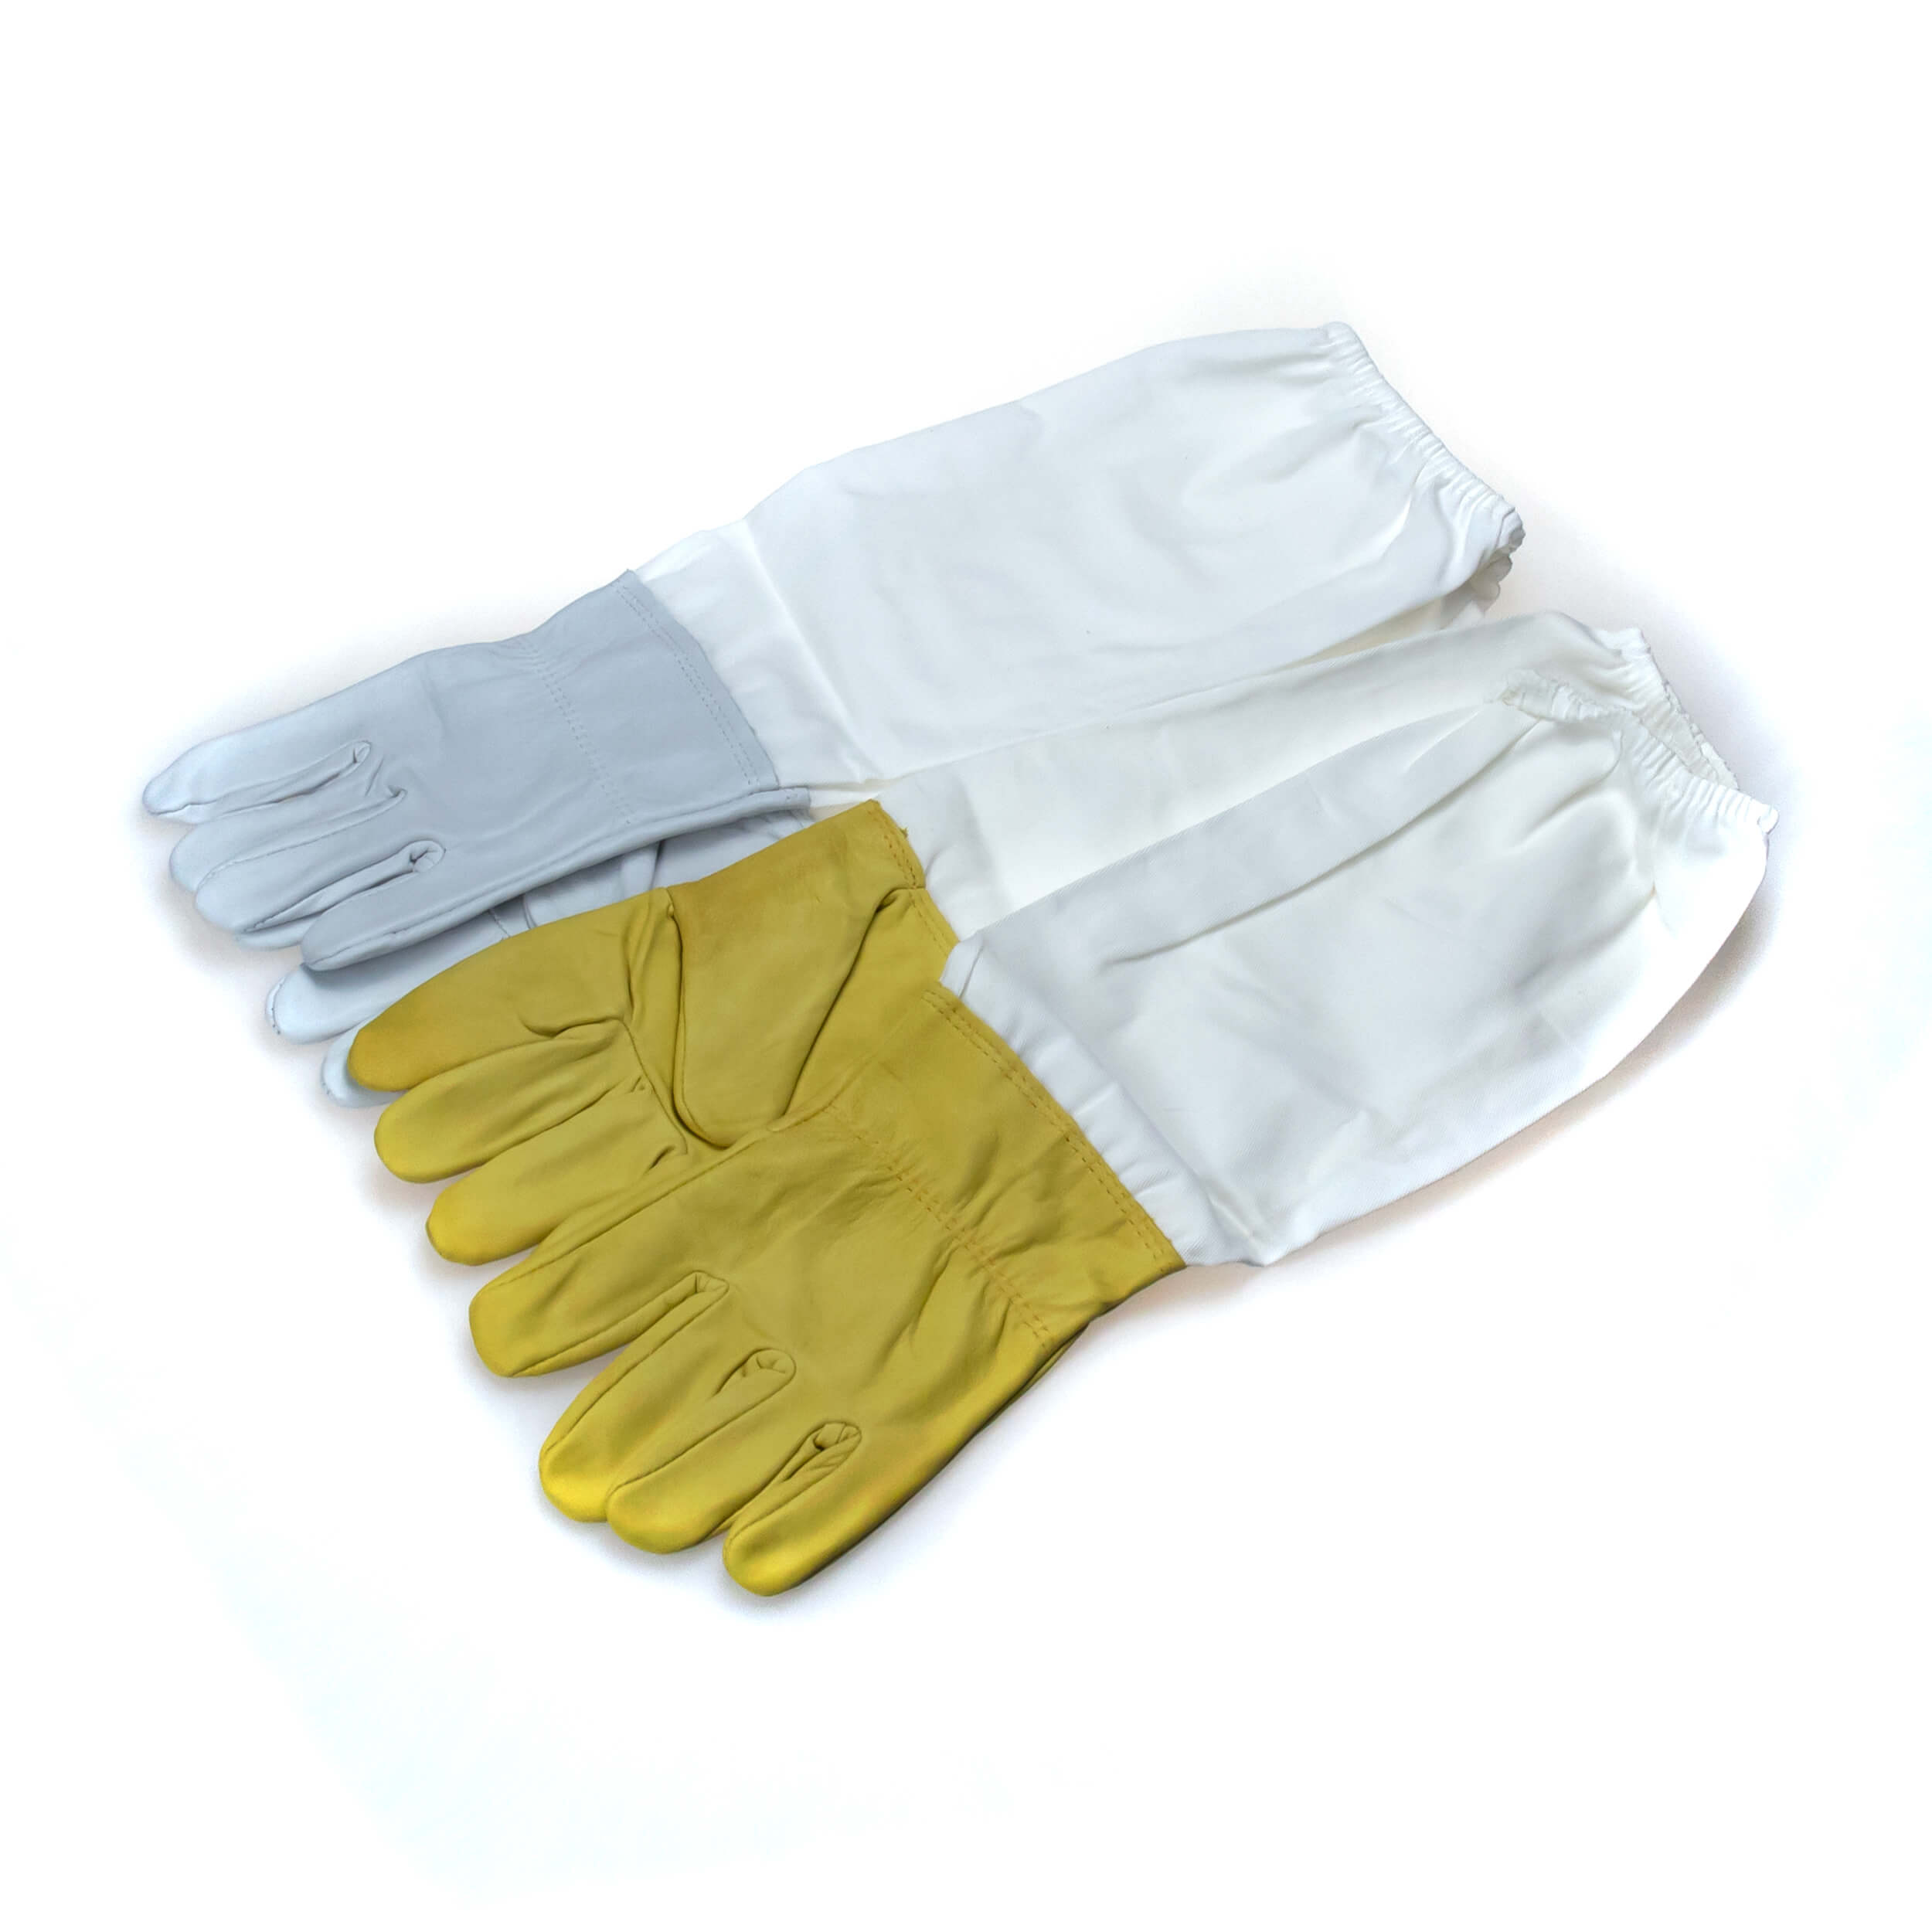 "Перчатки пчеловода ""Pro-leather-2"" (XL ~ 11 размер) фото"